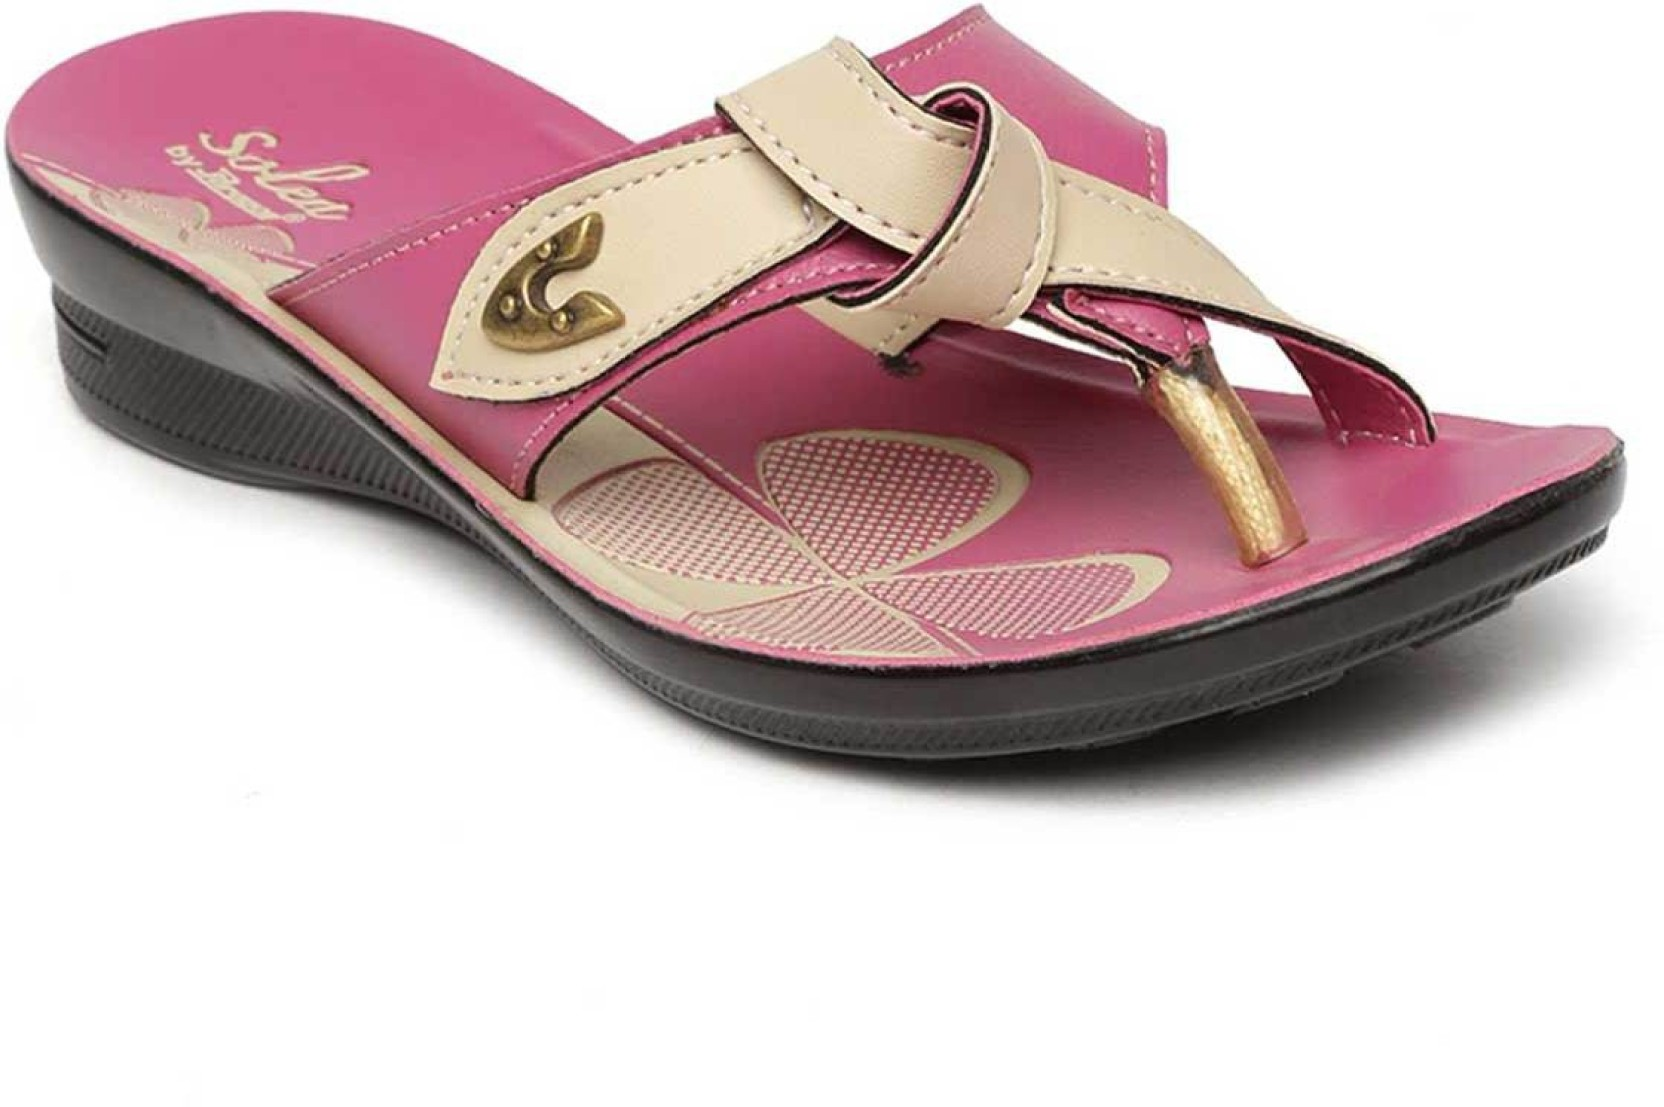 ee499b59098a Paragon Women Pink Sandals - Buy Paragon Women Pink Sandals Online ...